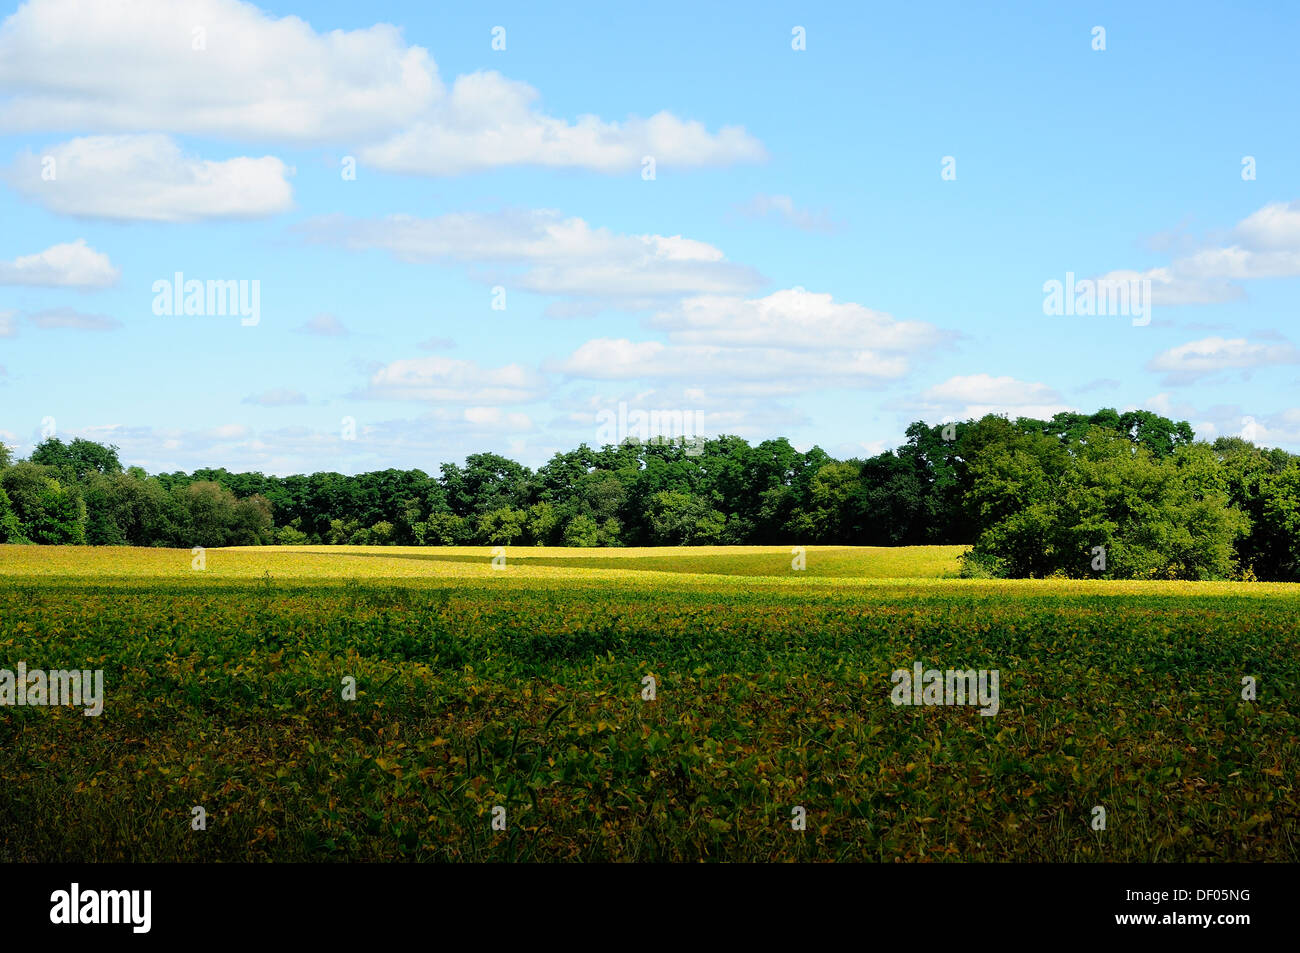 Northern Illinois landscape. - Stock Image